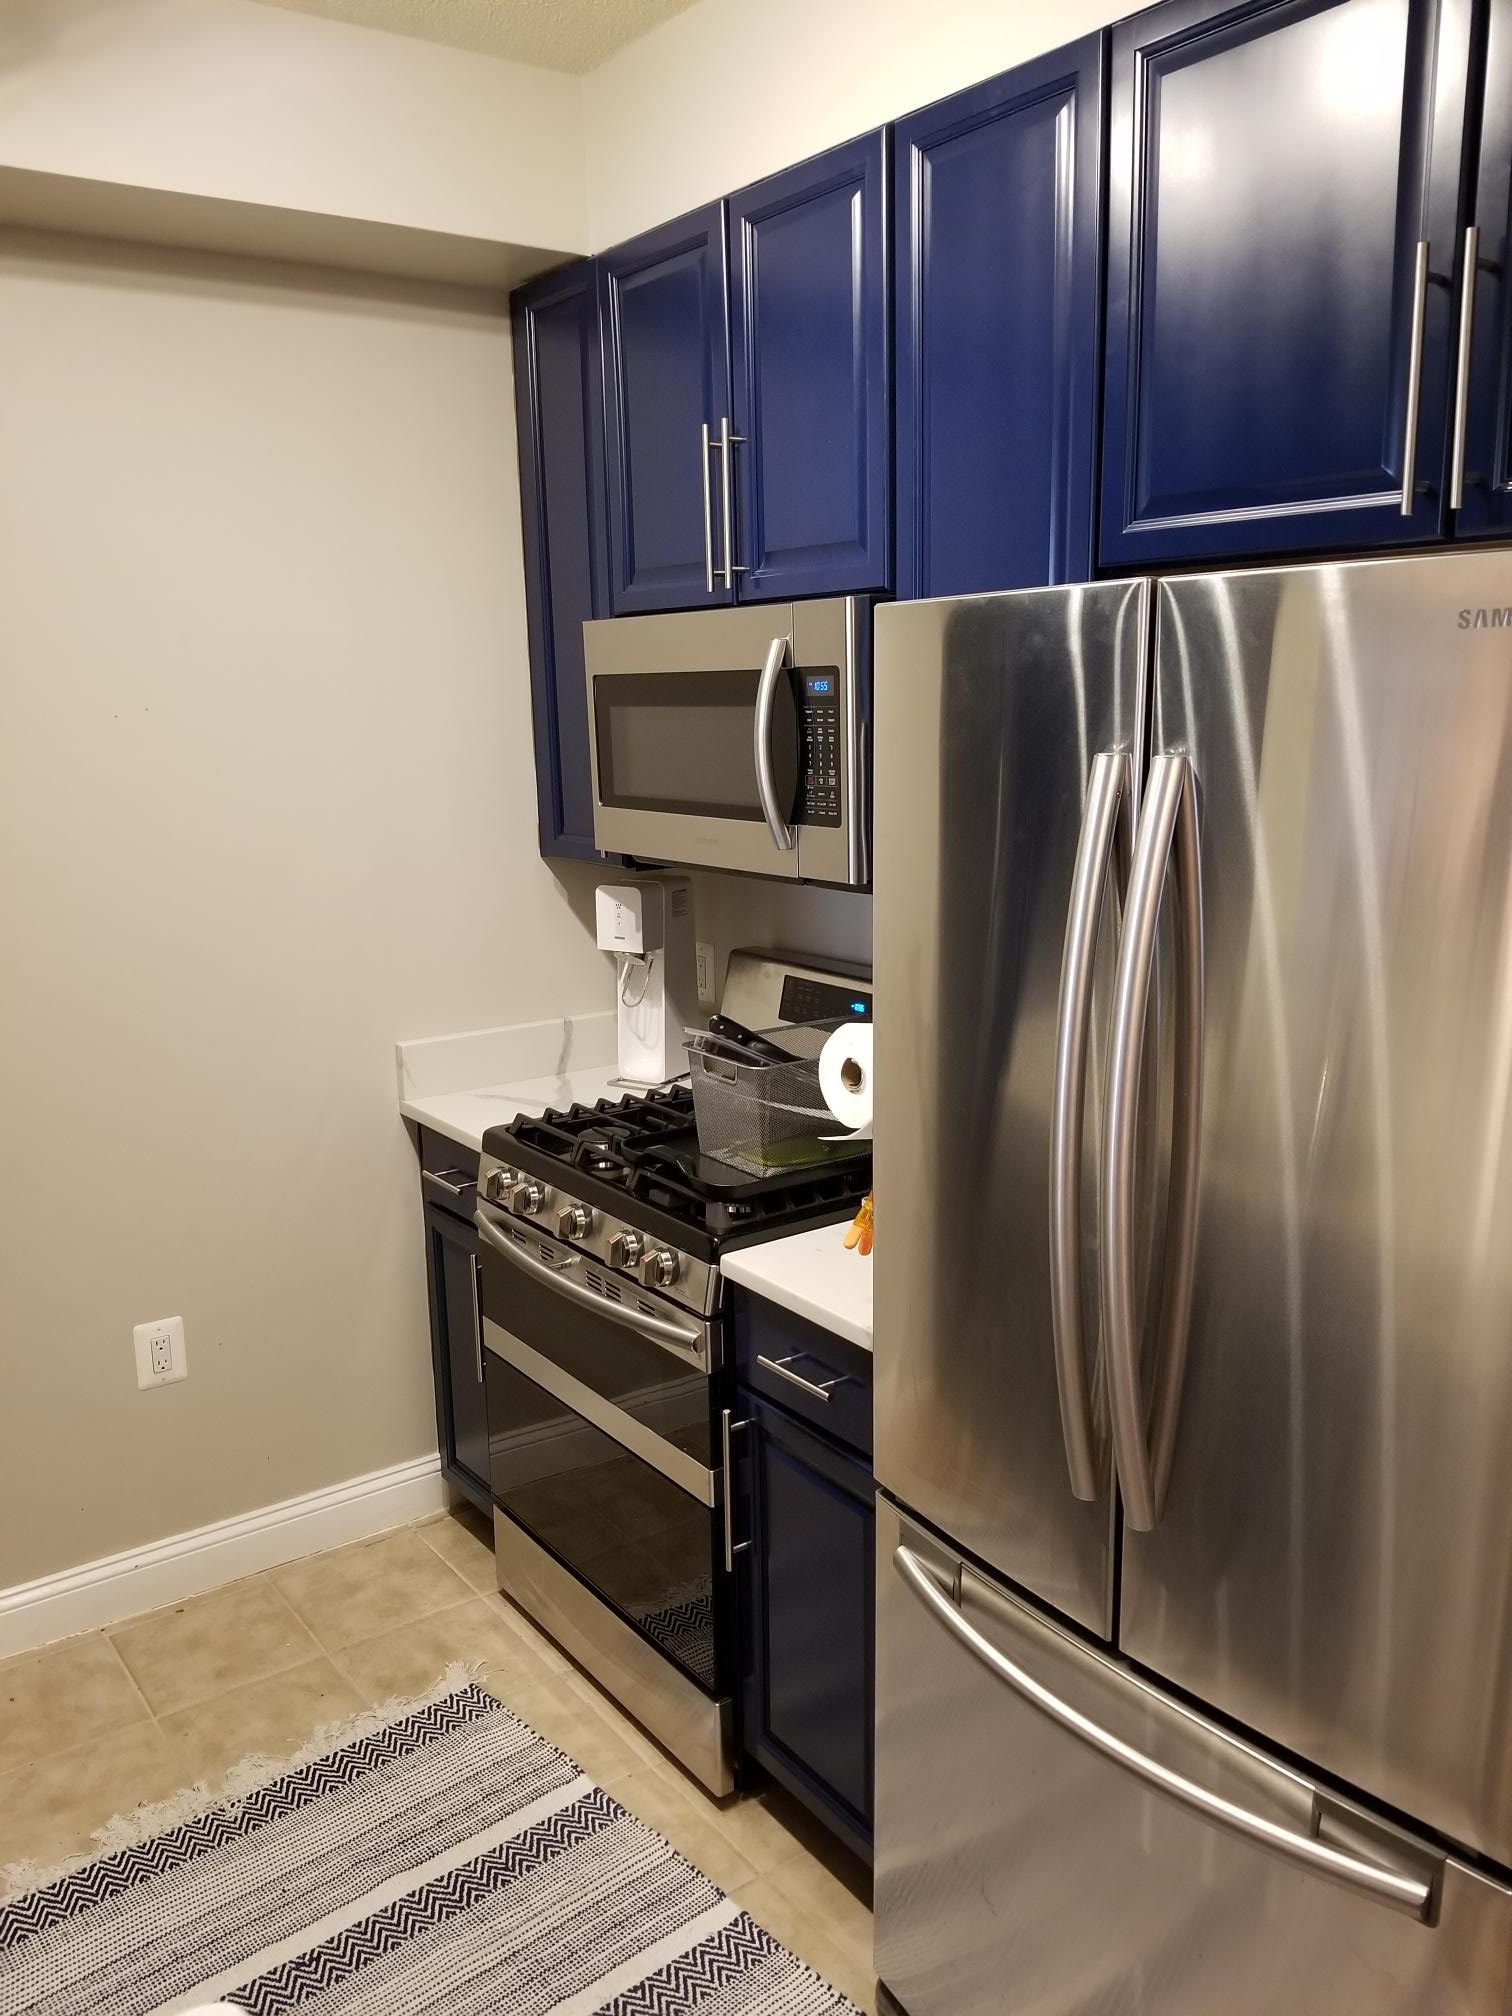 Bathroom & Kitchen Photo Gallery | Miracle Method of ...